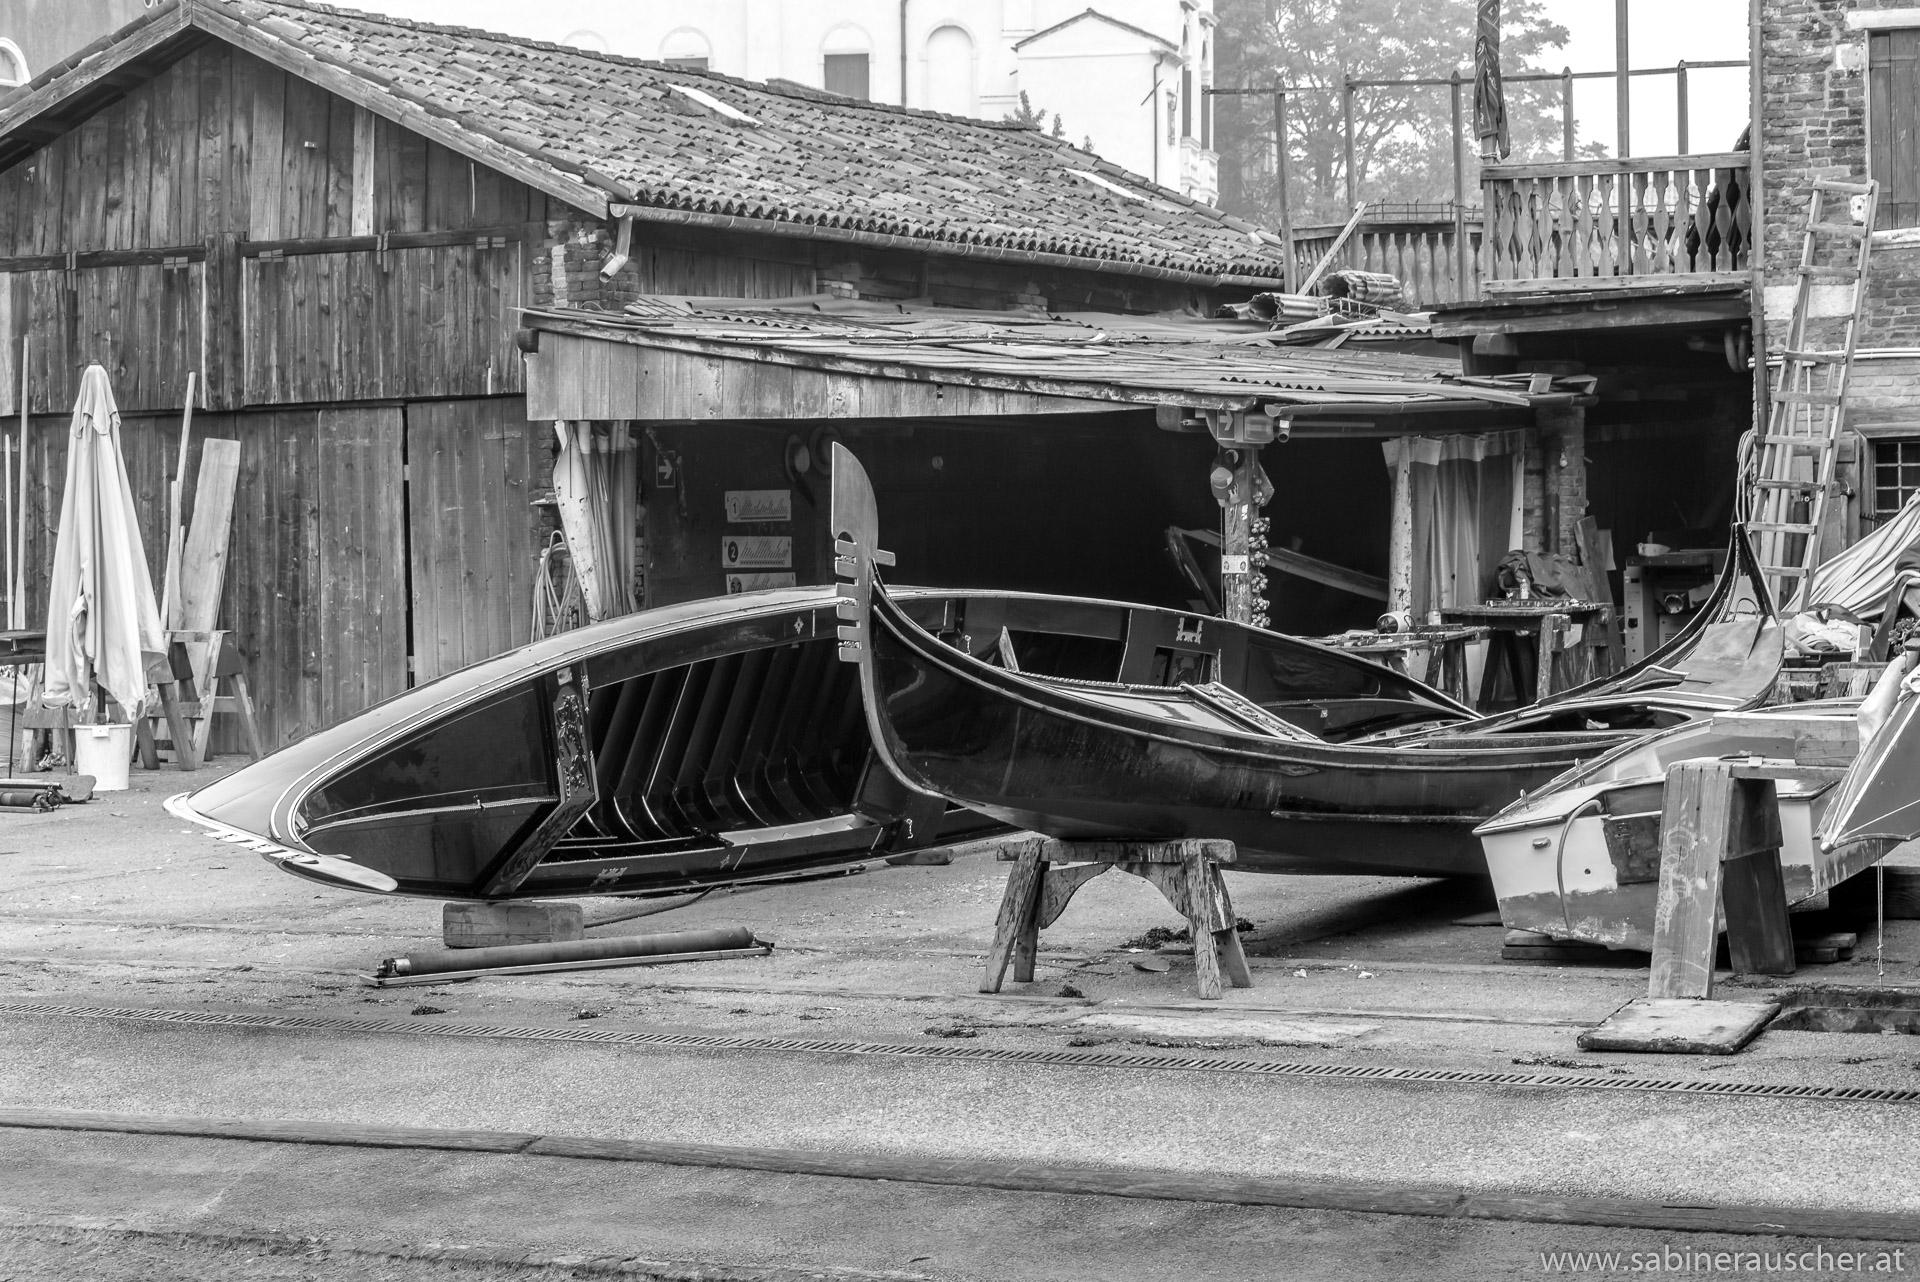 Venice - the wharf in Dorsoduro of Venice´s last builder of gondolas | Venedig - die letzte Gondelbauerwerft liegt in Dorsoduro